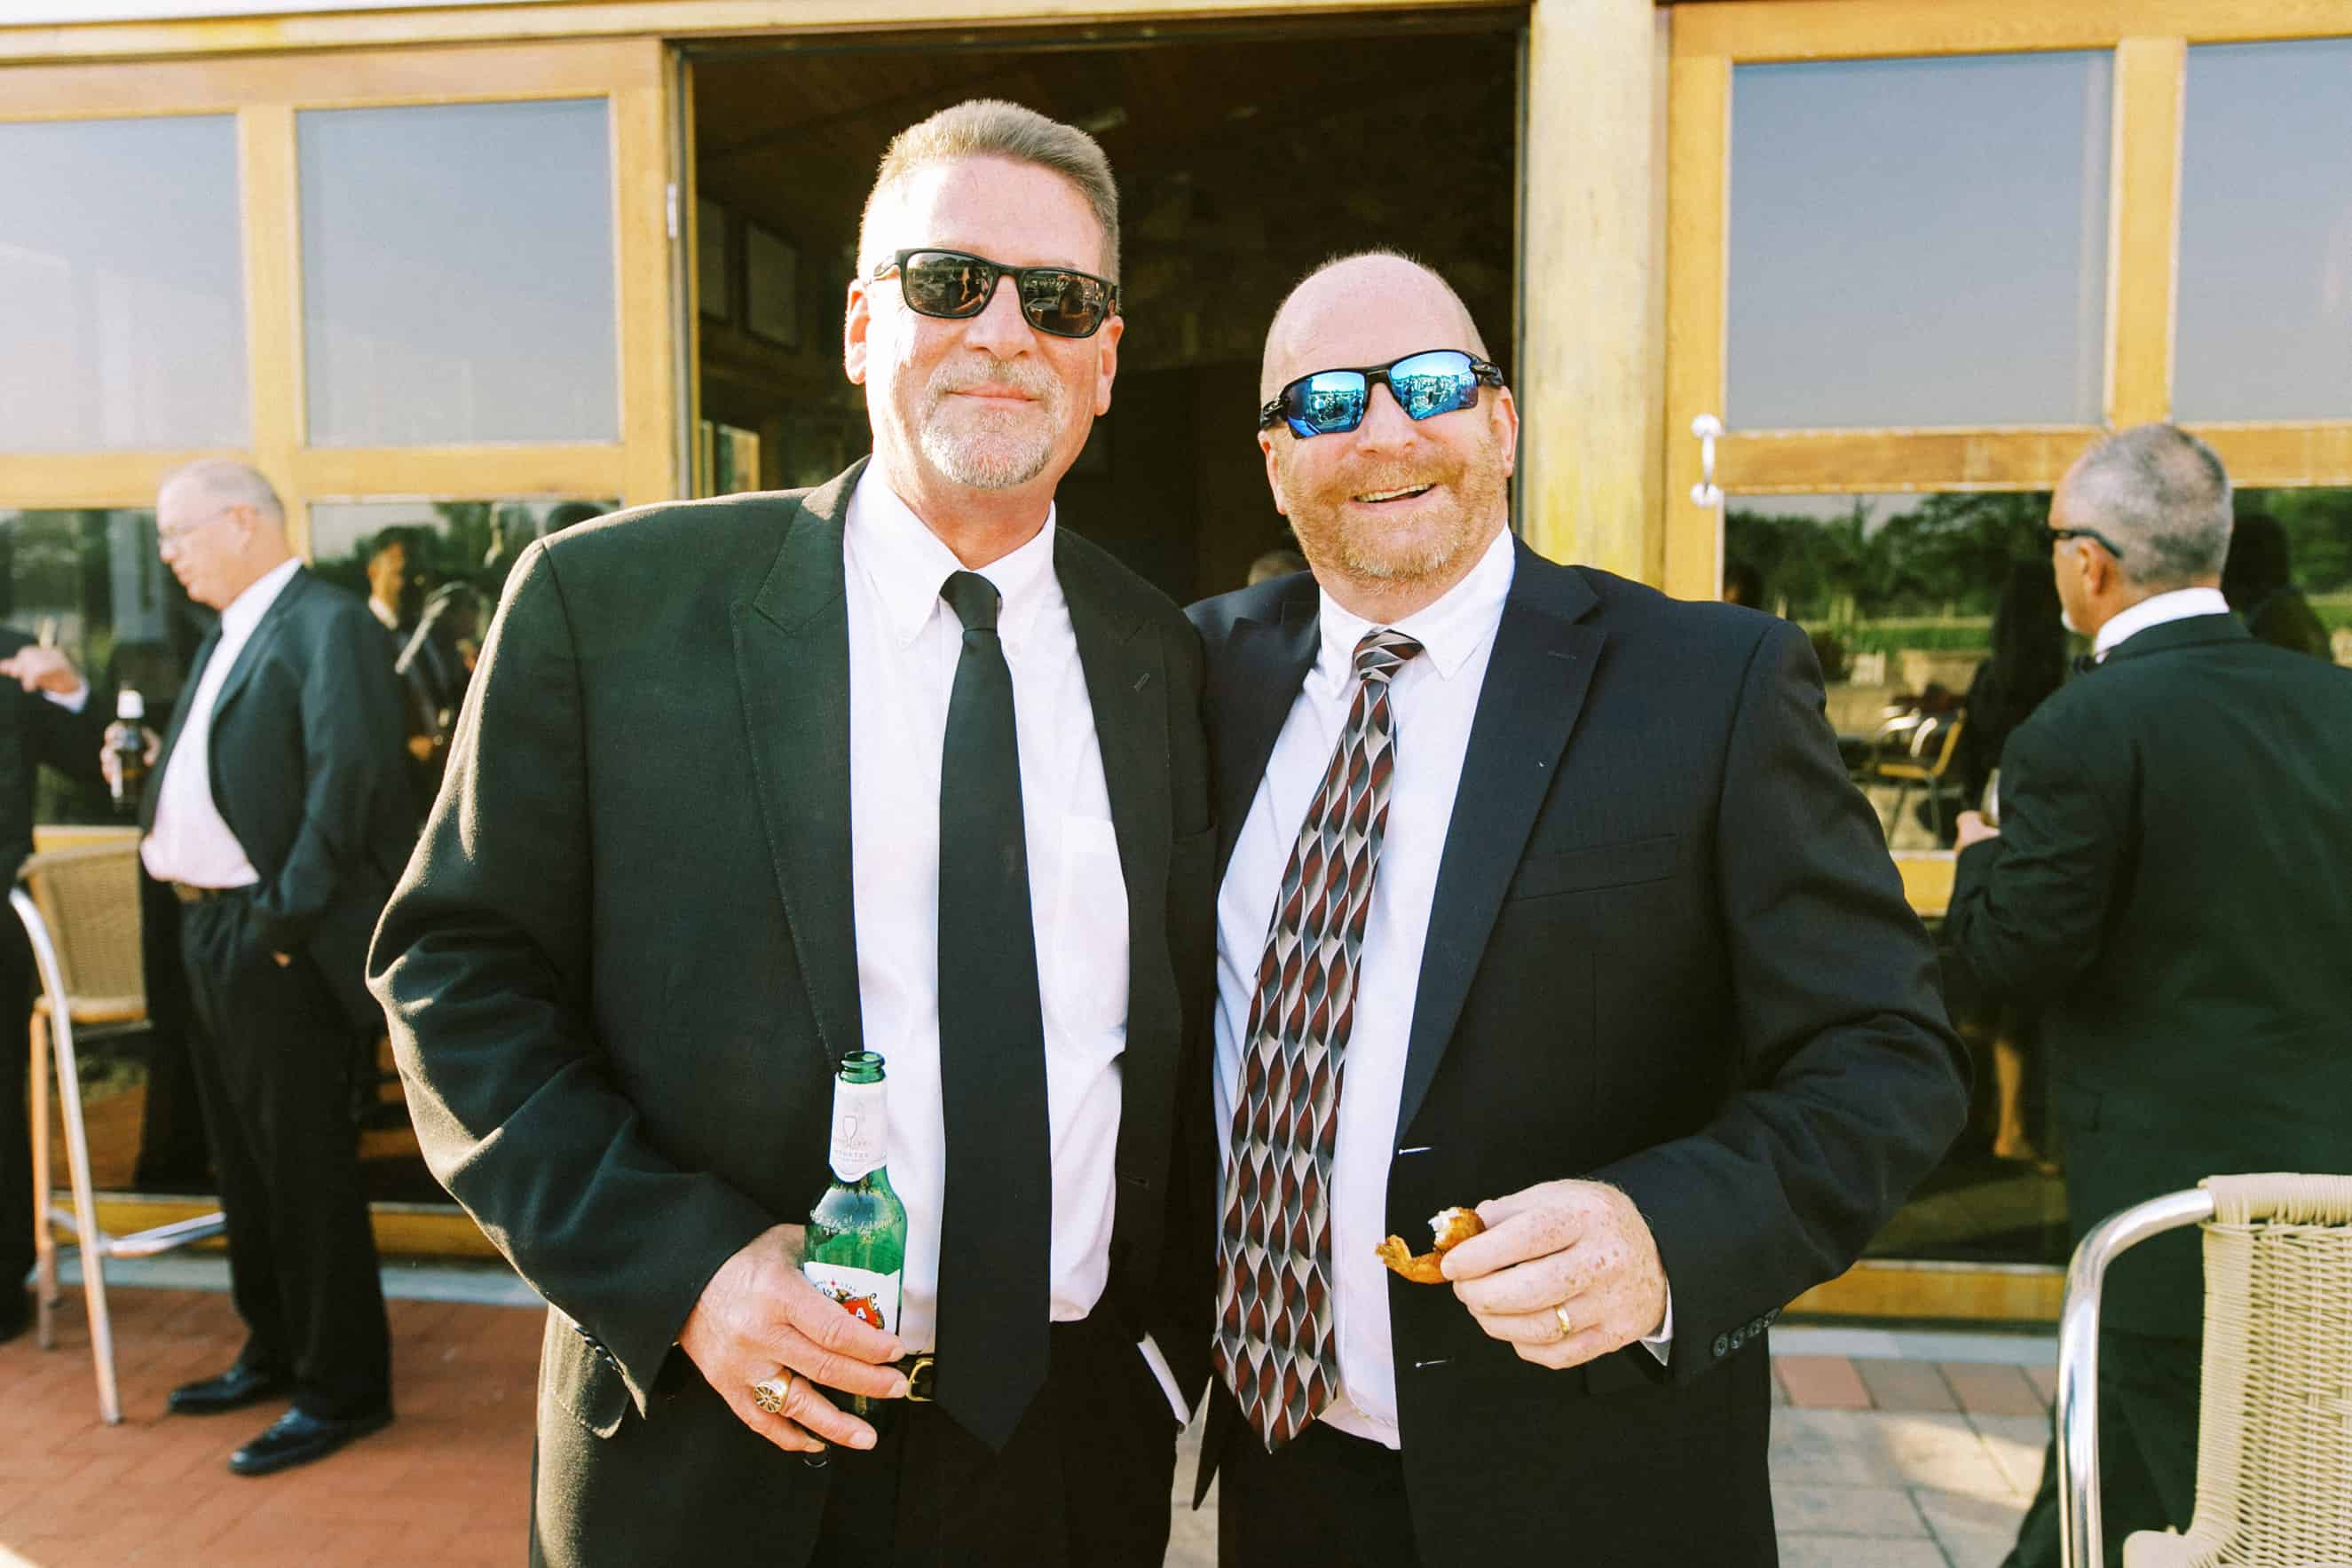 Cape May Wedding Receptions